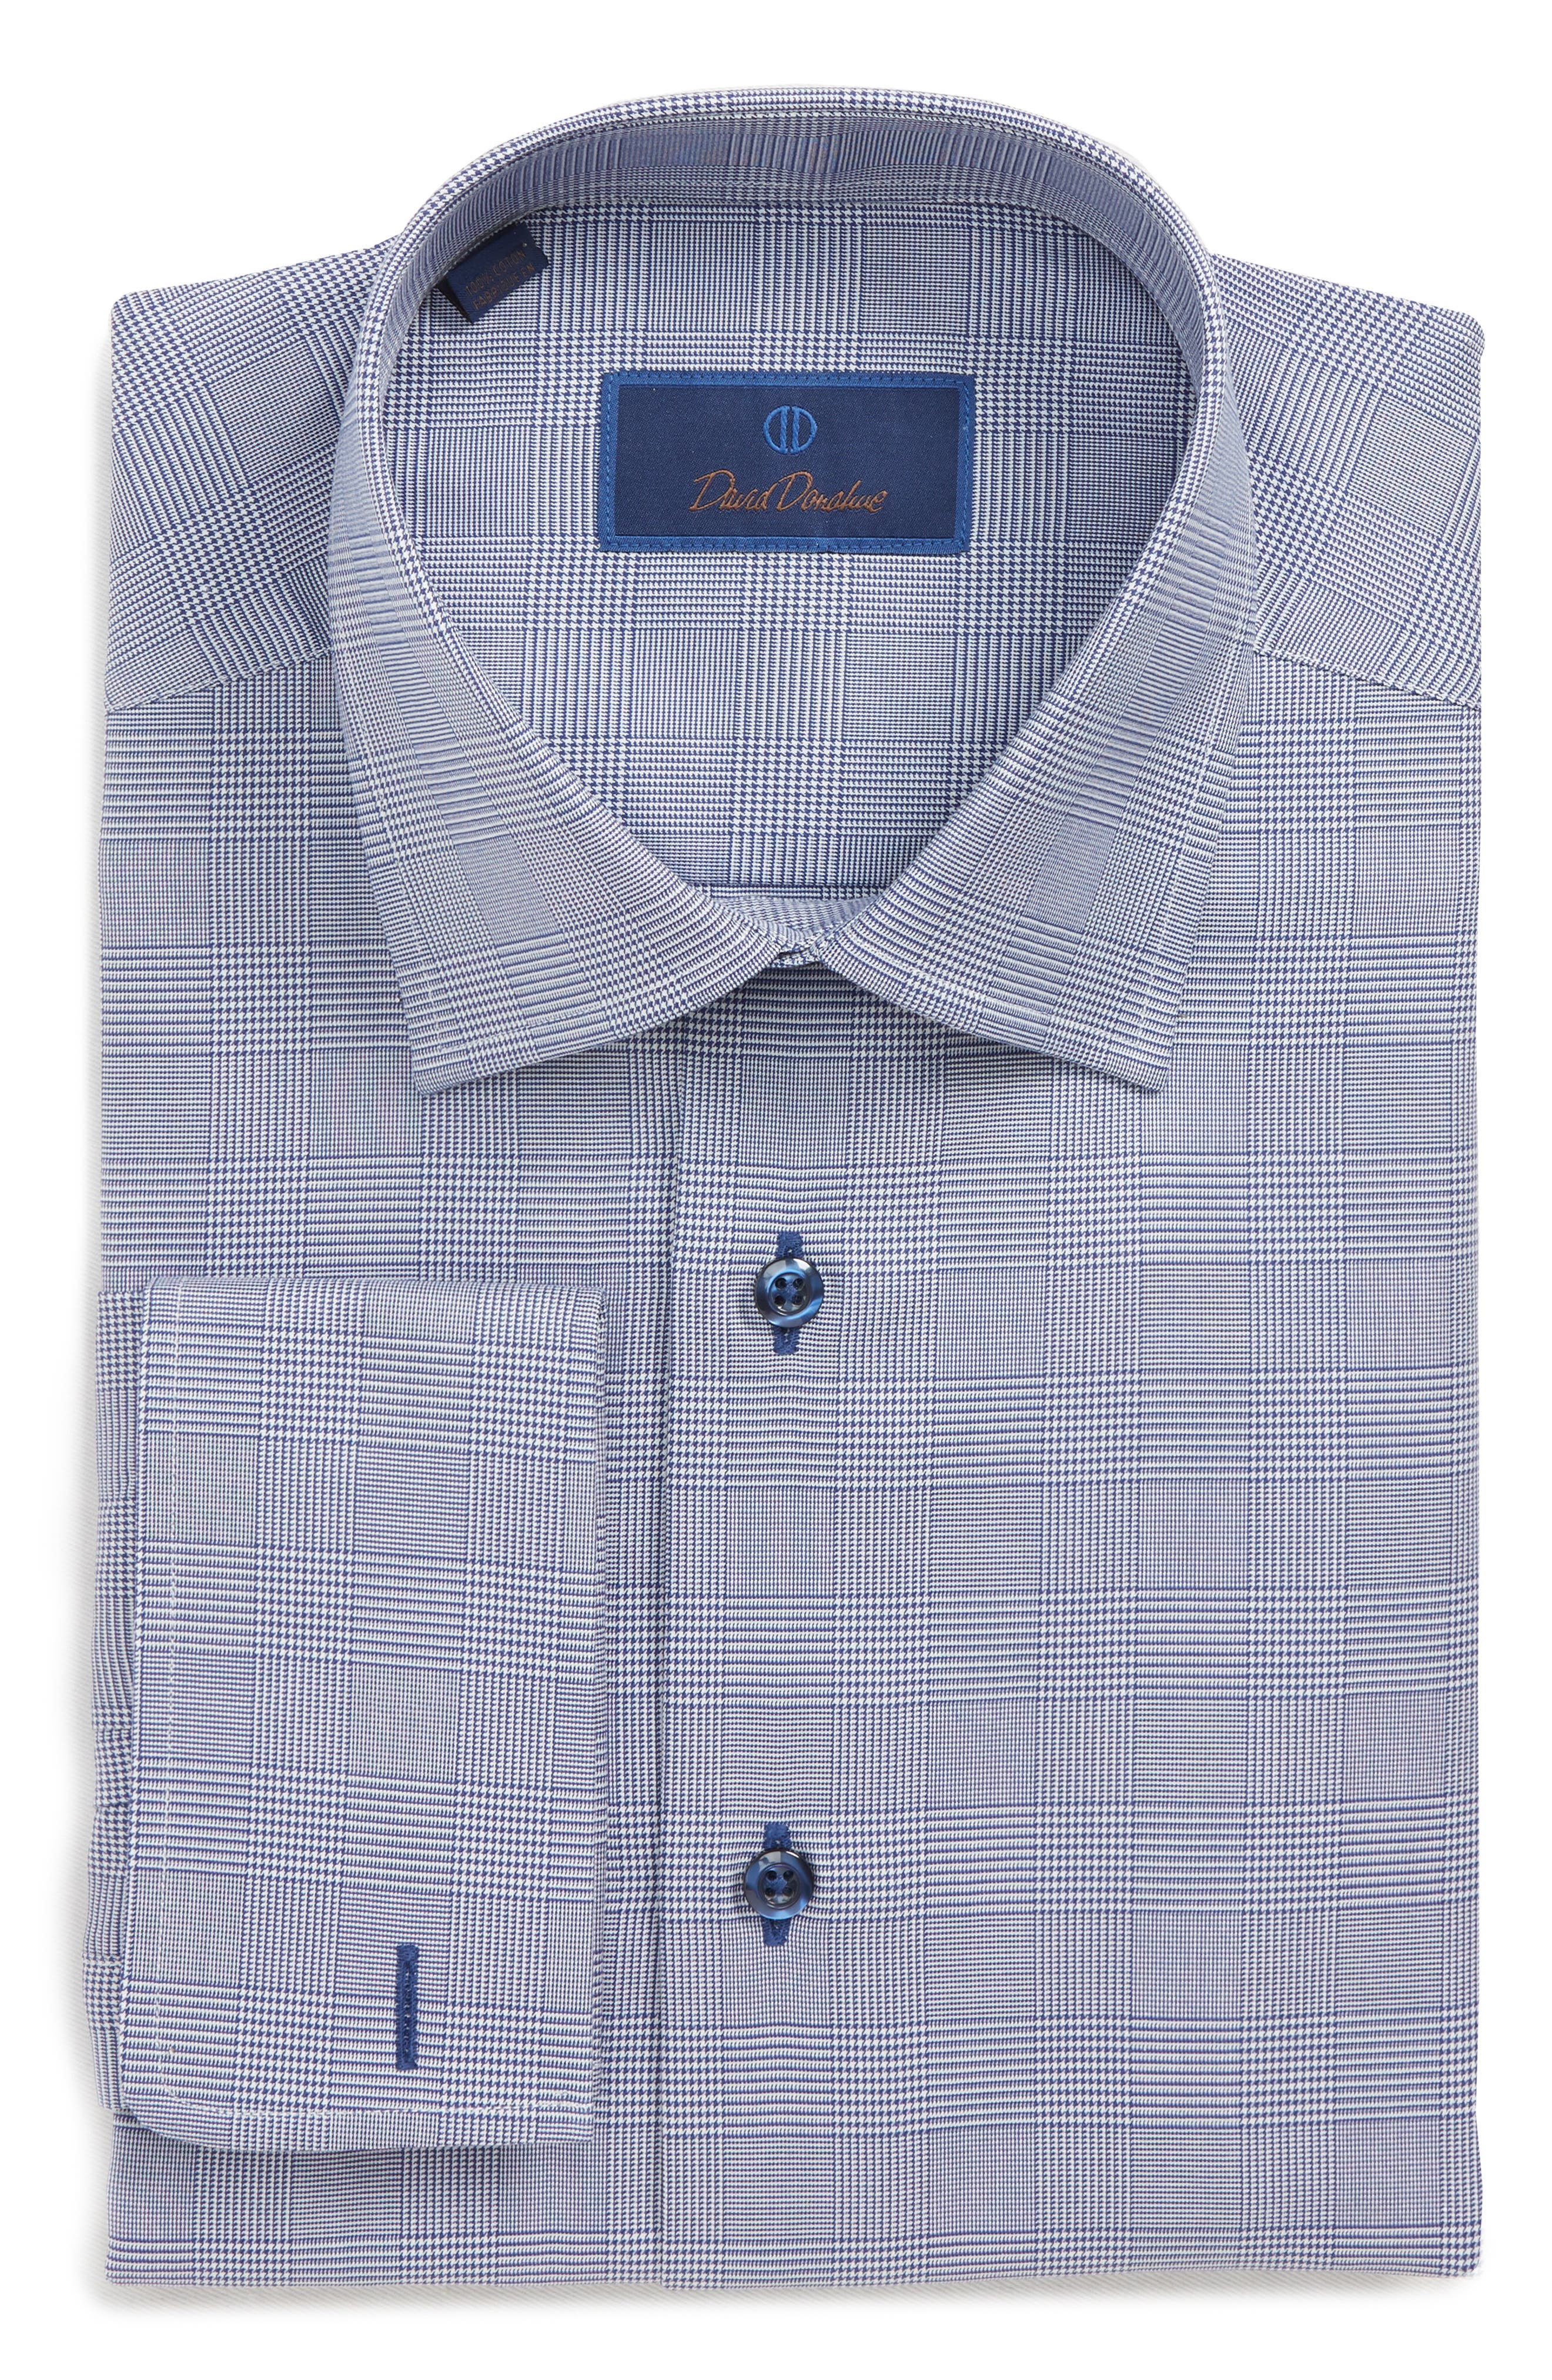 Regular Fit Plaid Dress Shirt,                         Main,                         color, NAVY